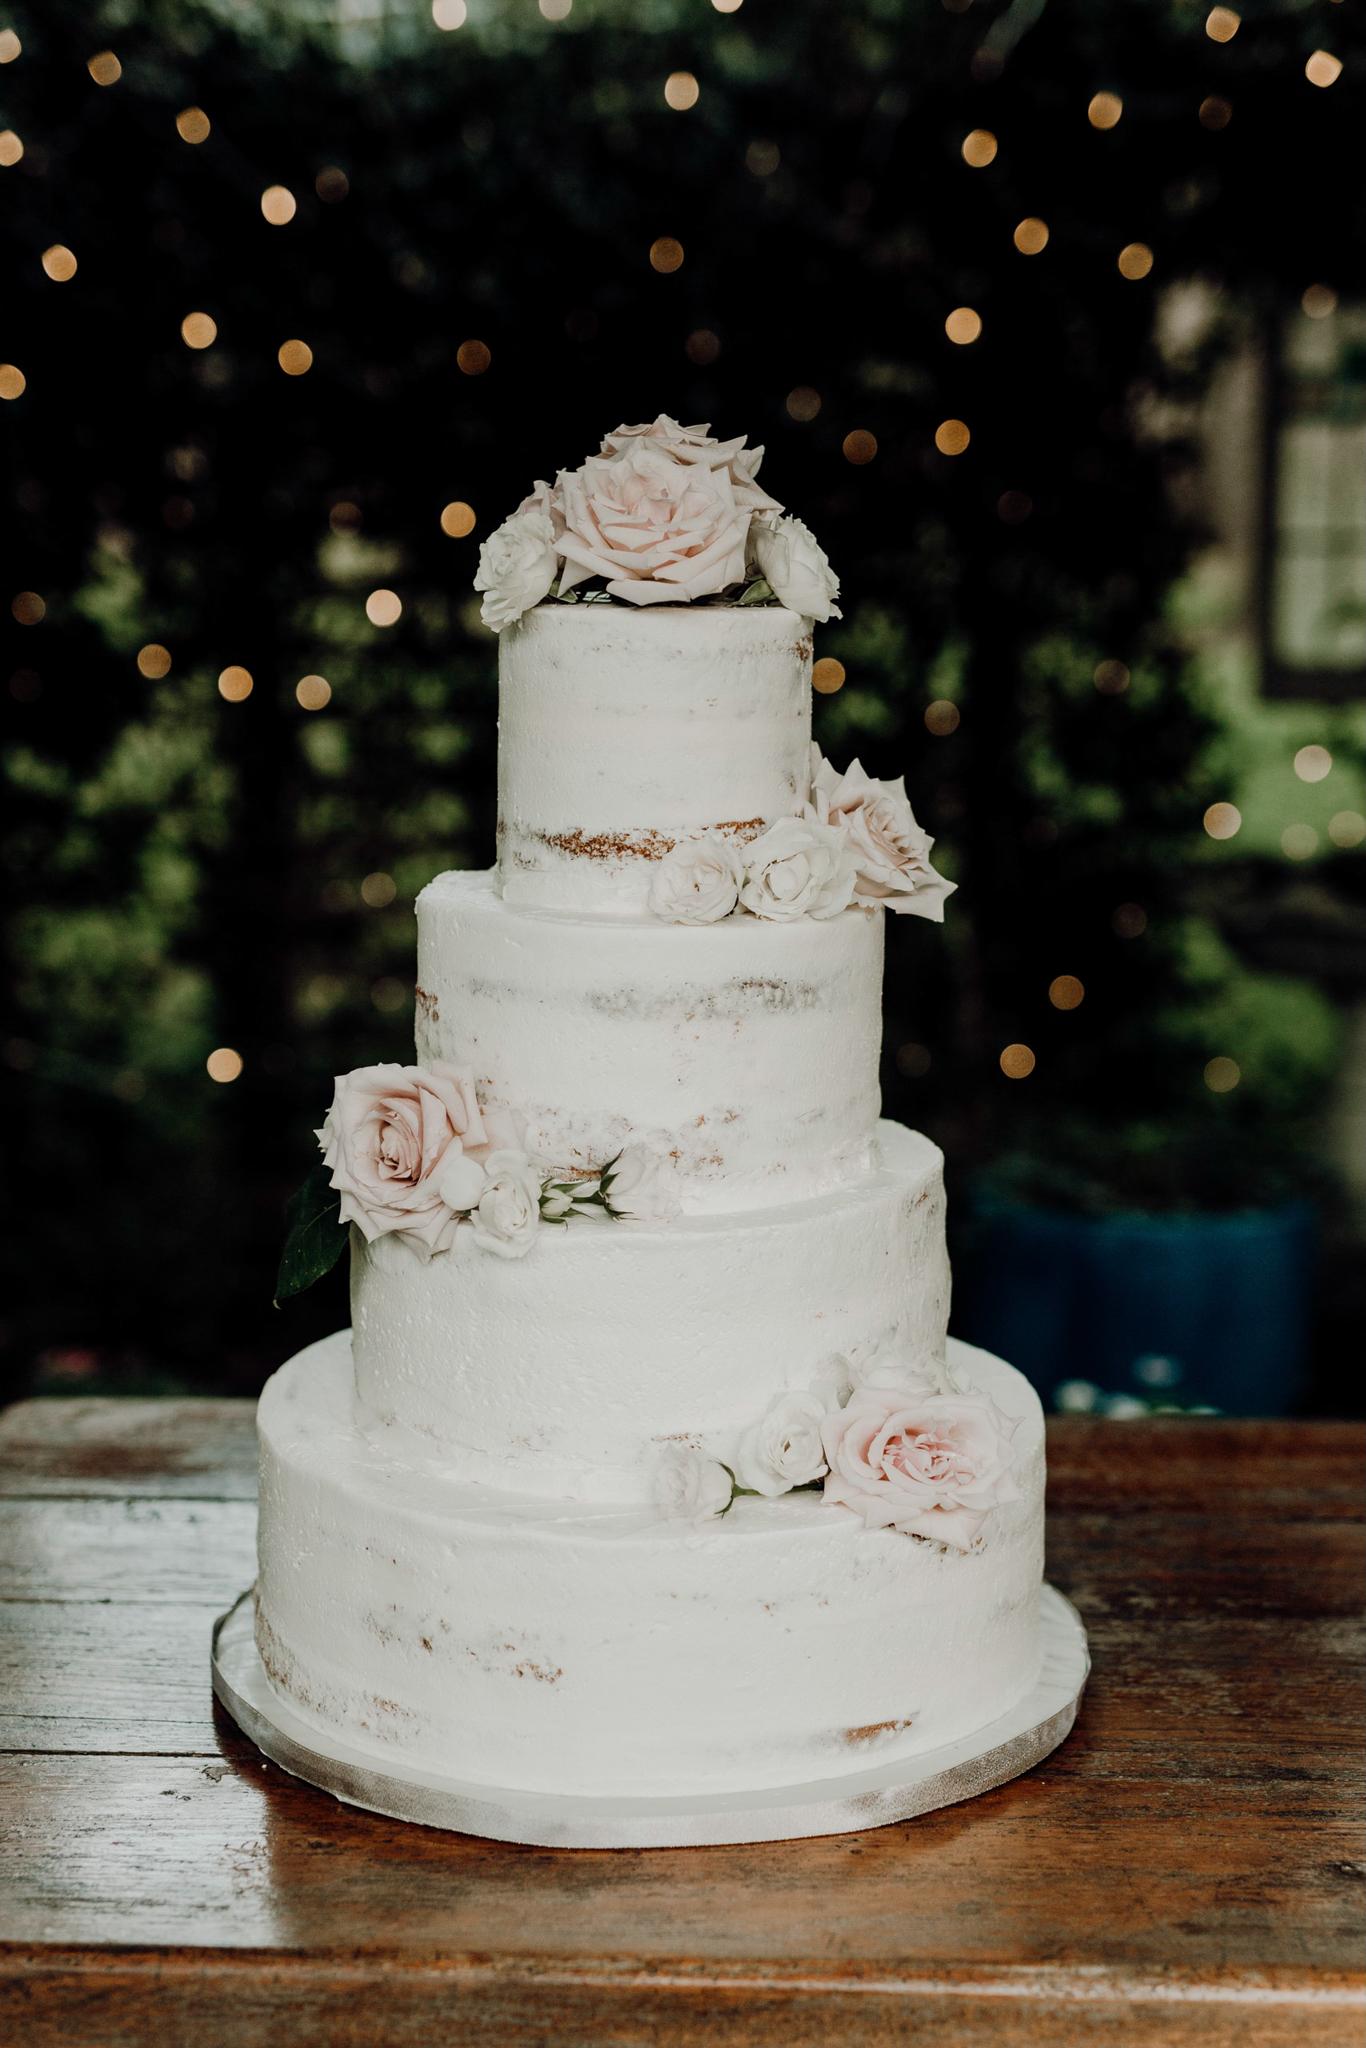 Houston Wedding Photographer-Intimate Texas Backyard Wedding- Houston Wedding Photographer -Kristen Giles Photography-53.jpg